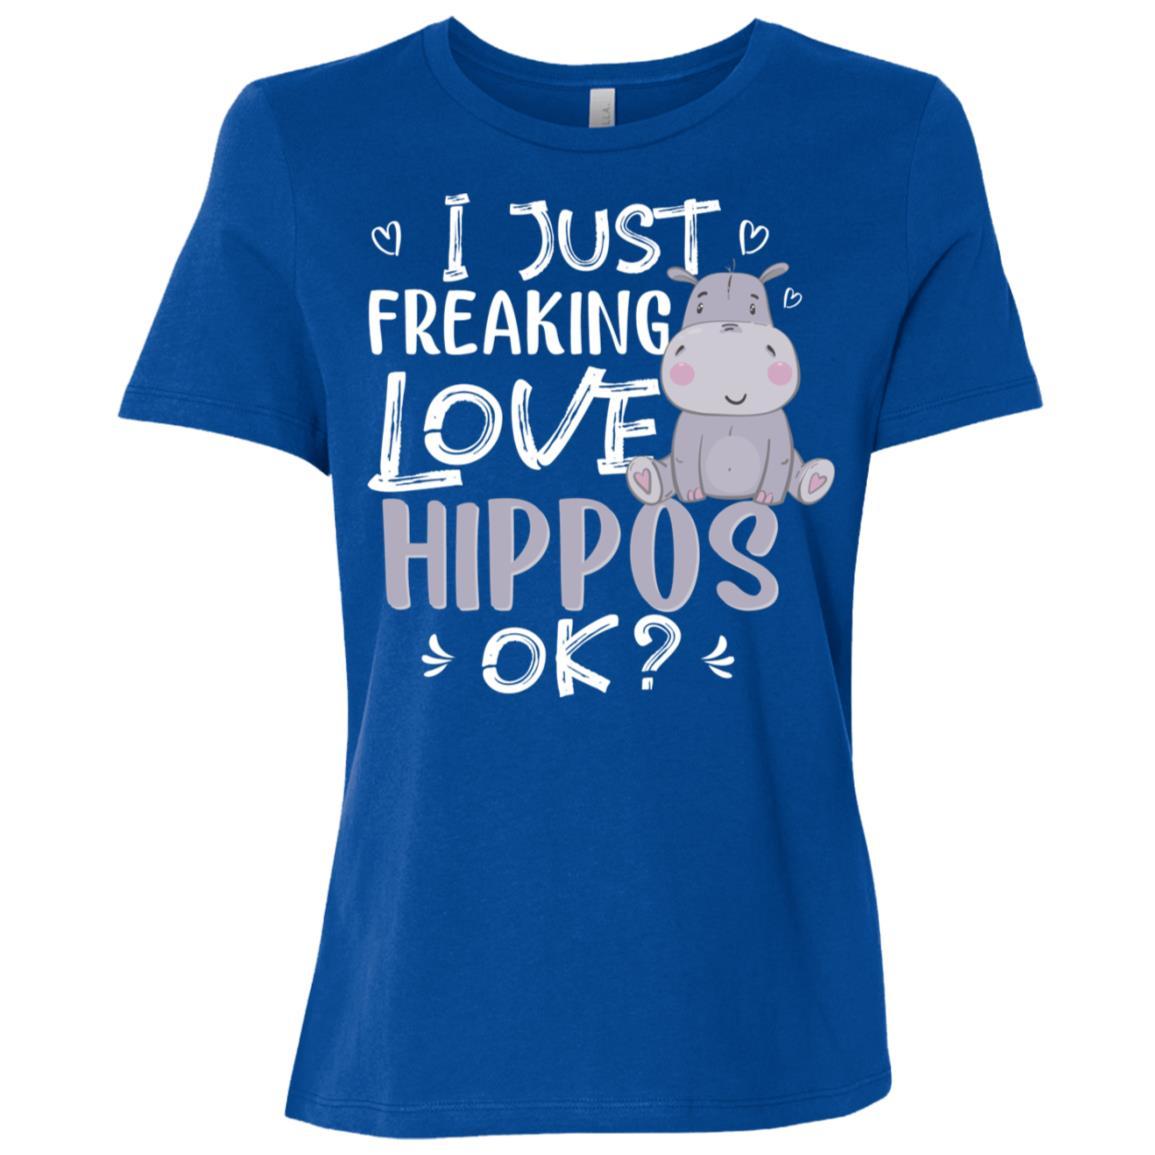 I Just Freaking Love Hippos Ok Cute Animal Critter Women Short Sleeve T-Shirt